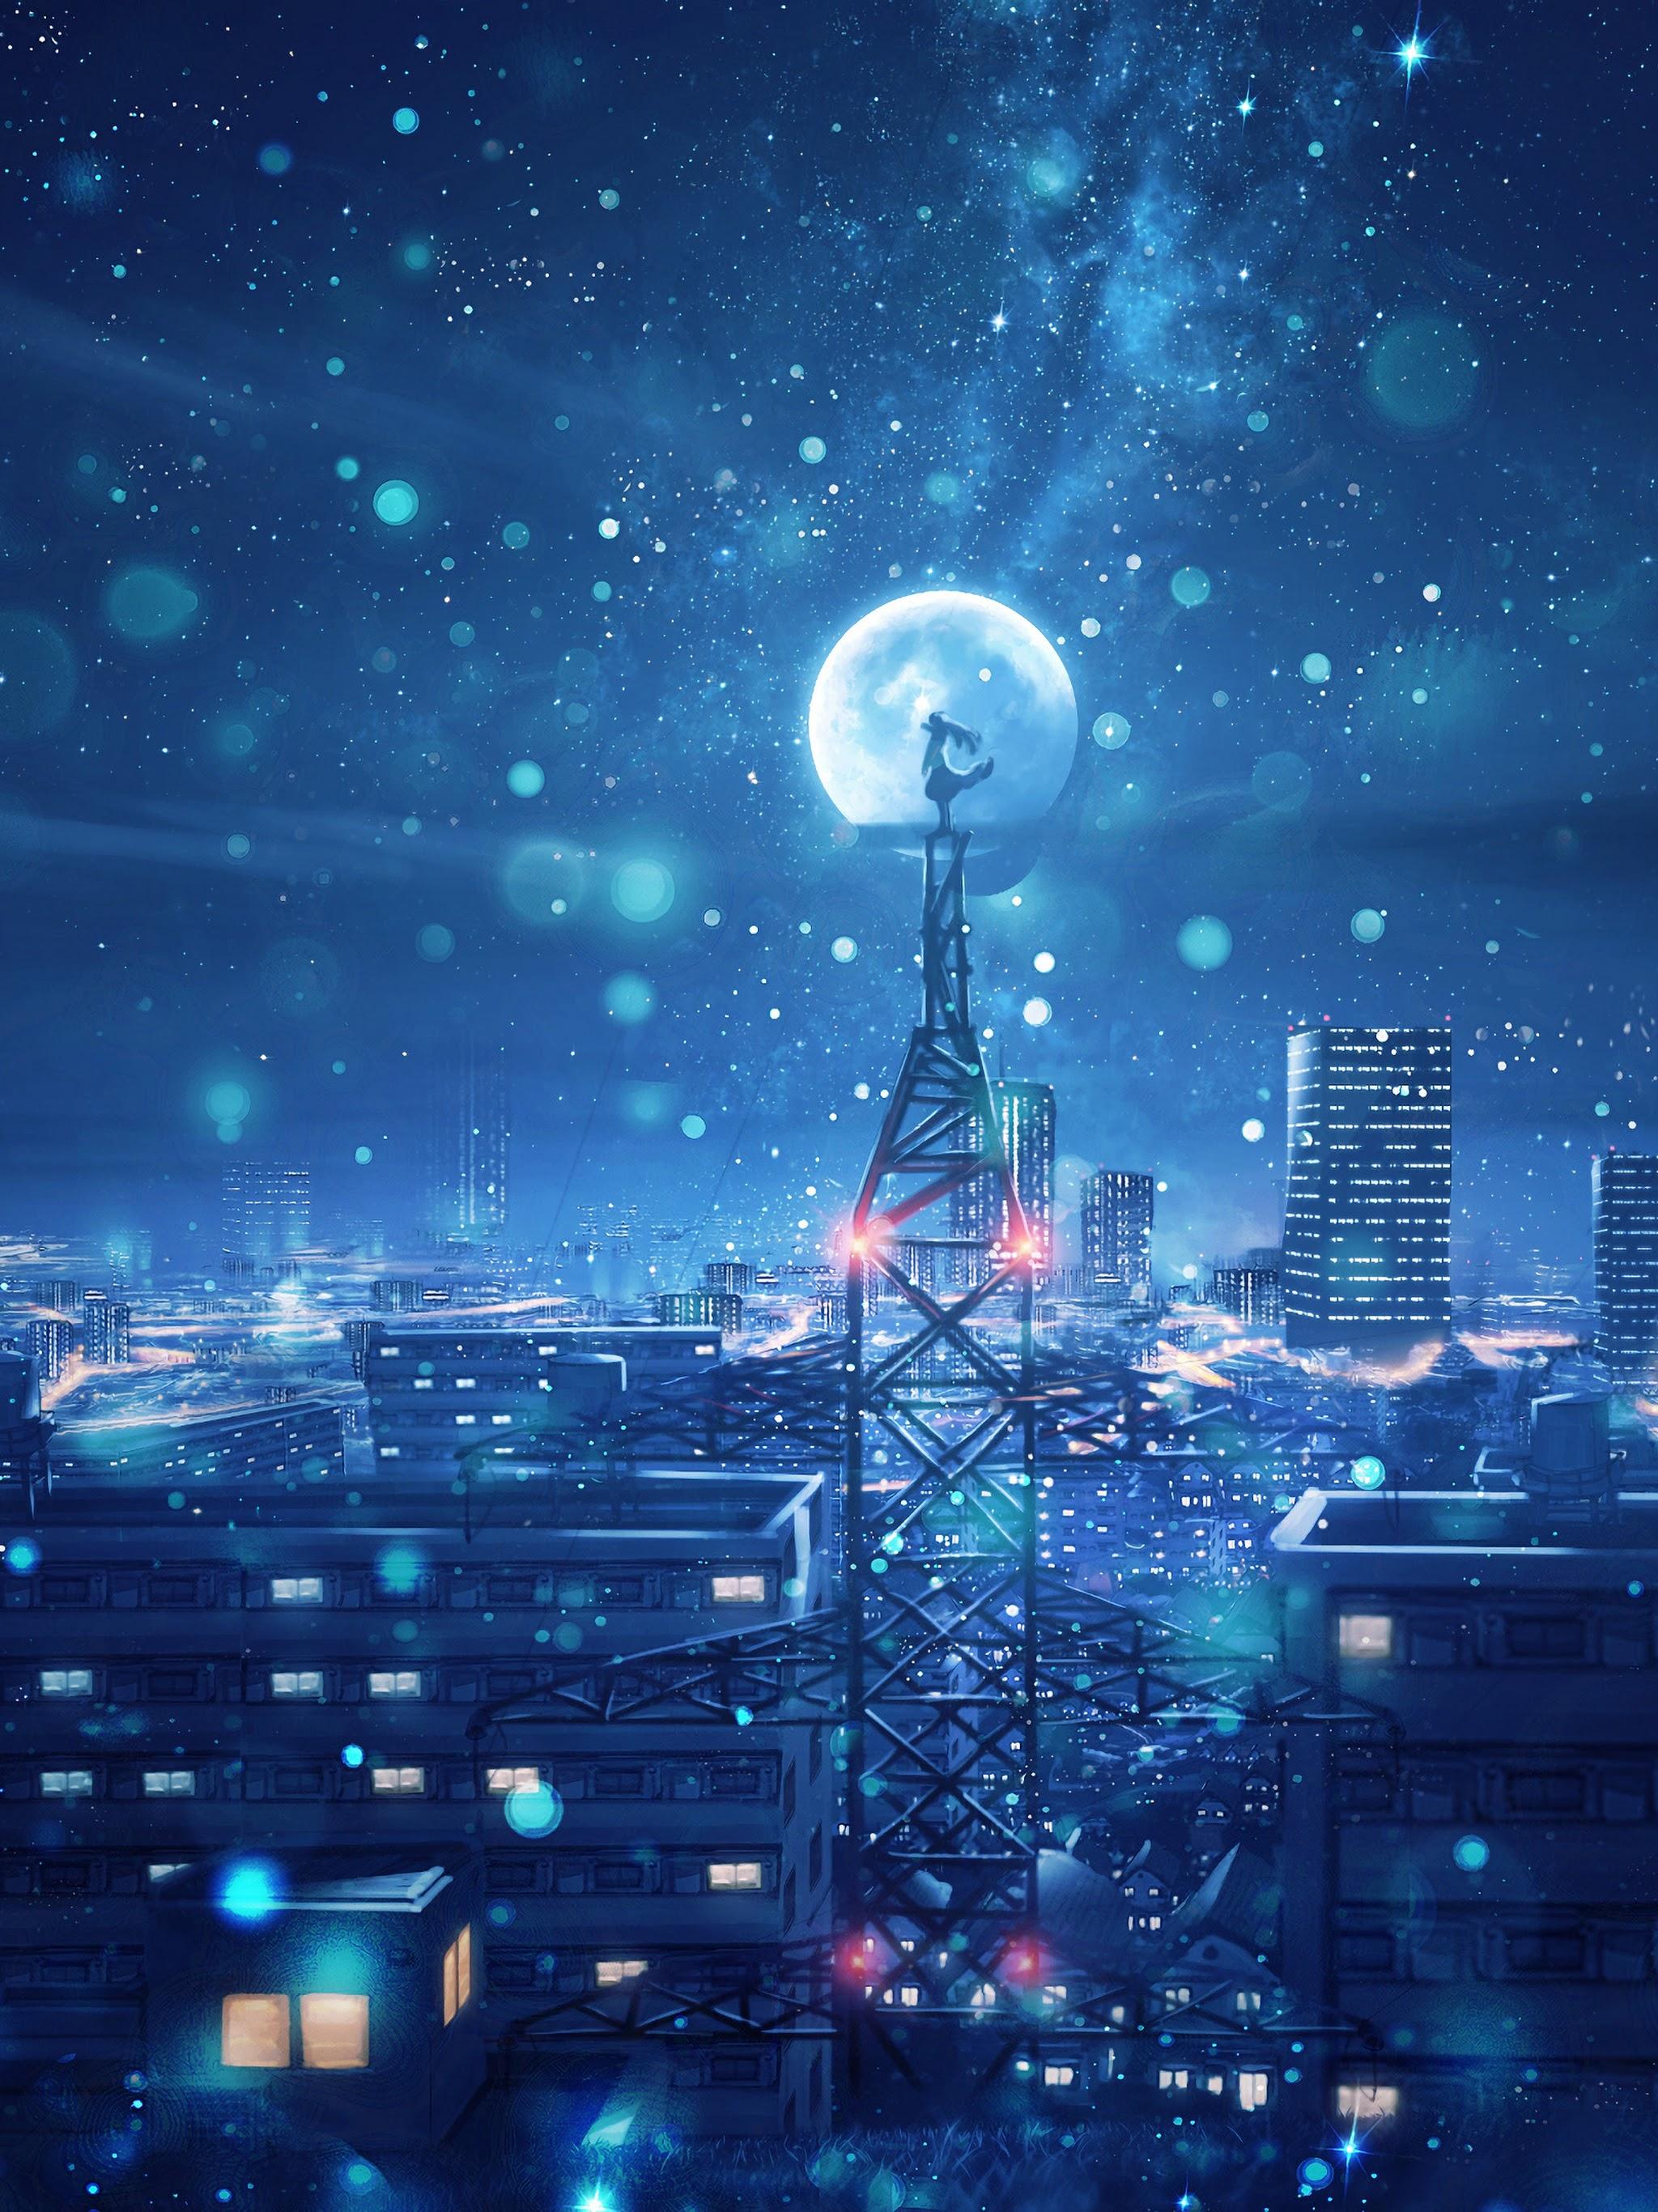 Night Sky City Stars Anime Scenery 4K Wallpaper 135 2048x2732